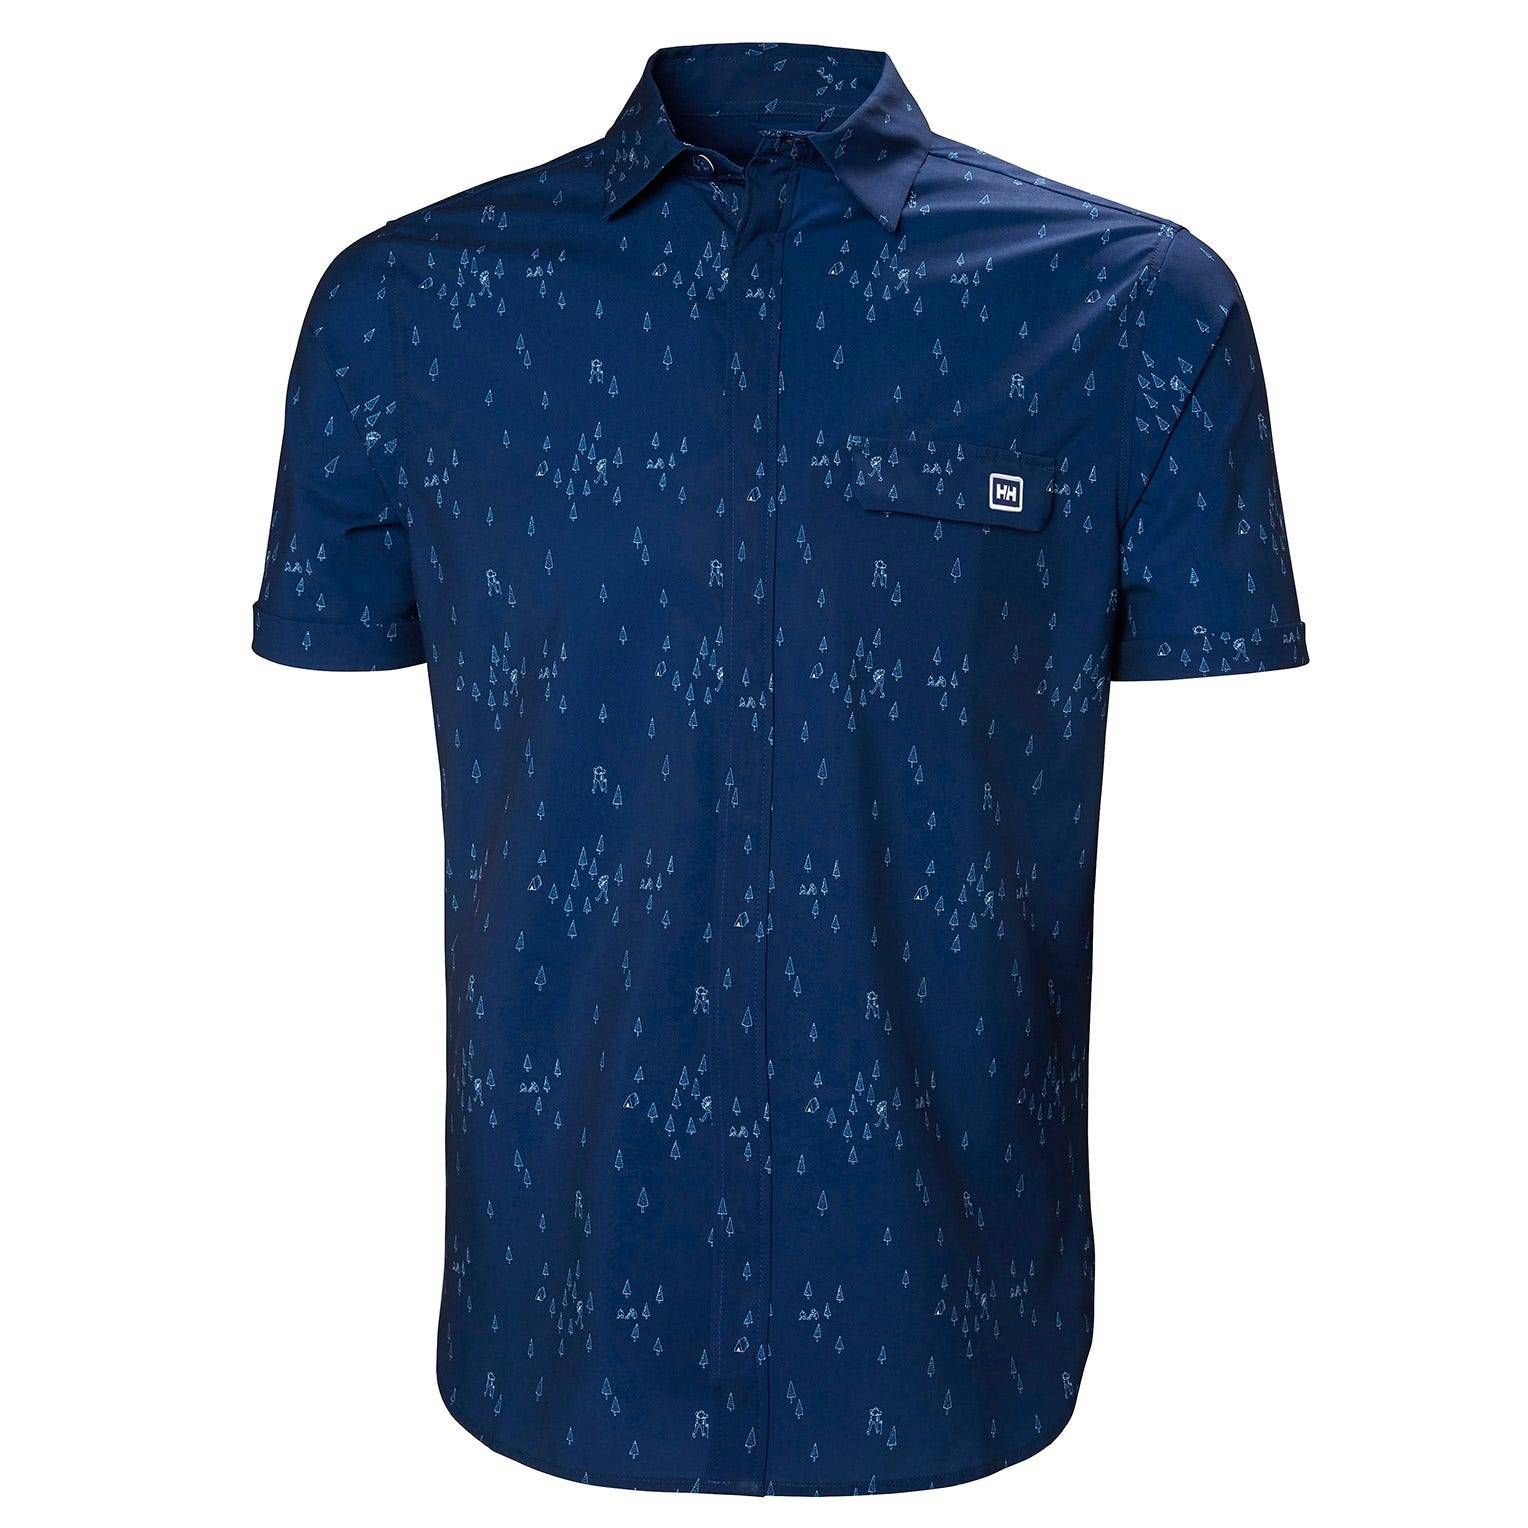 Helly Hansen Oya Shirt Blue S